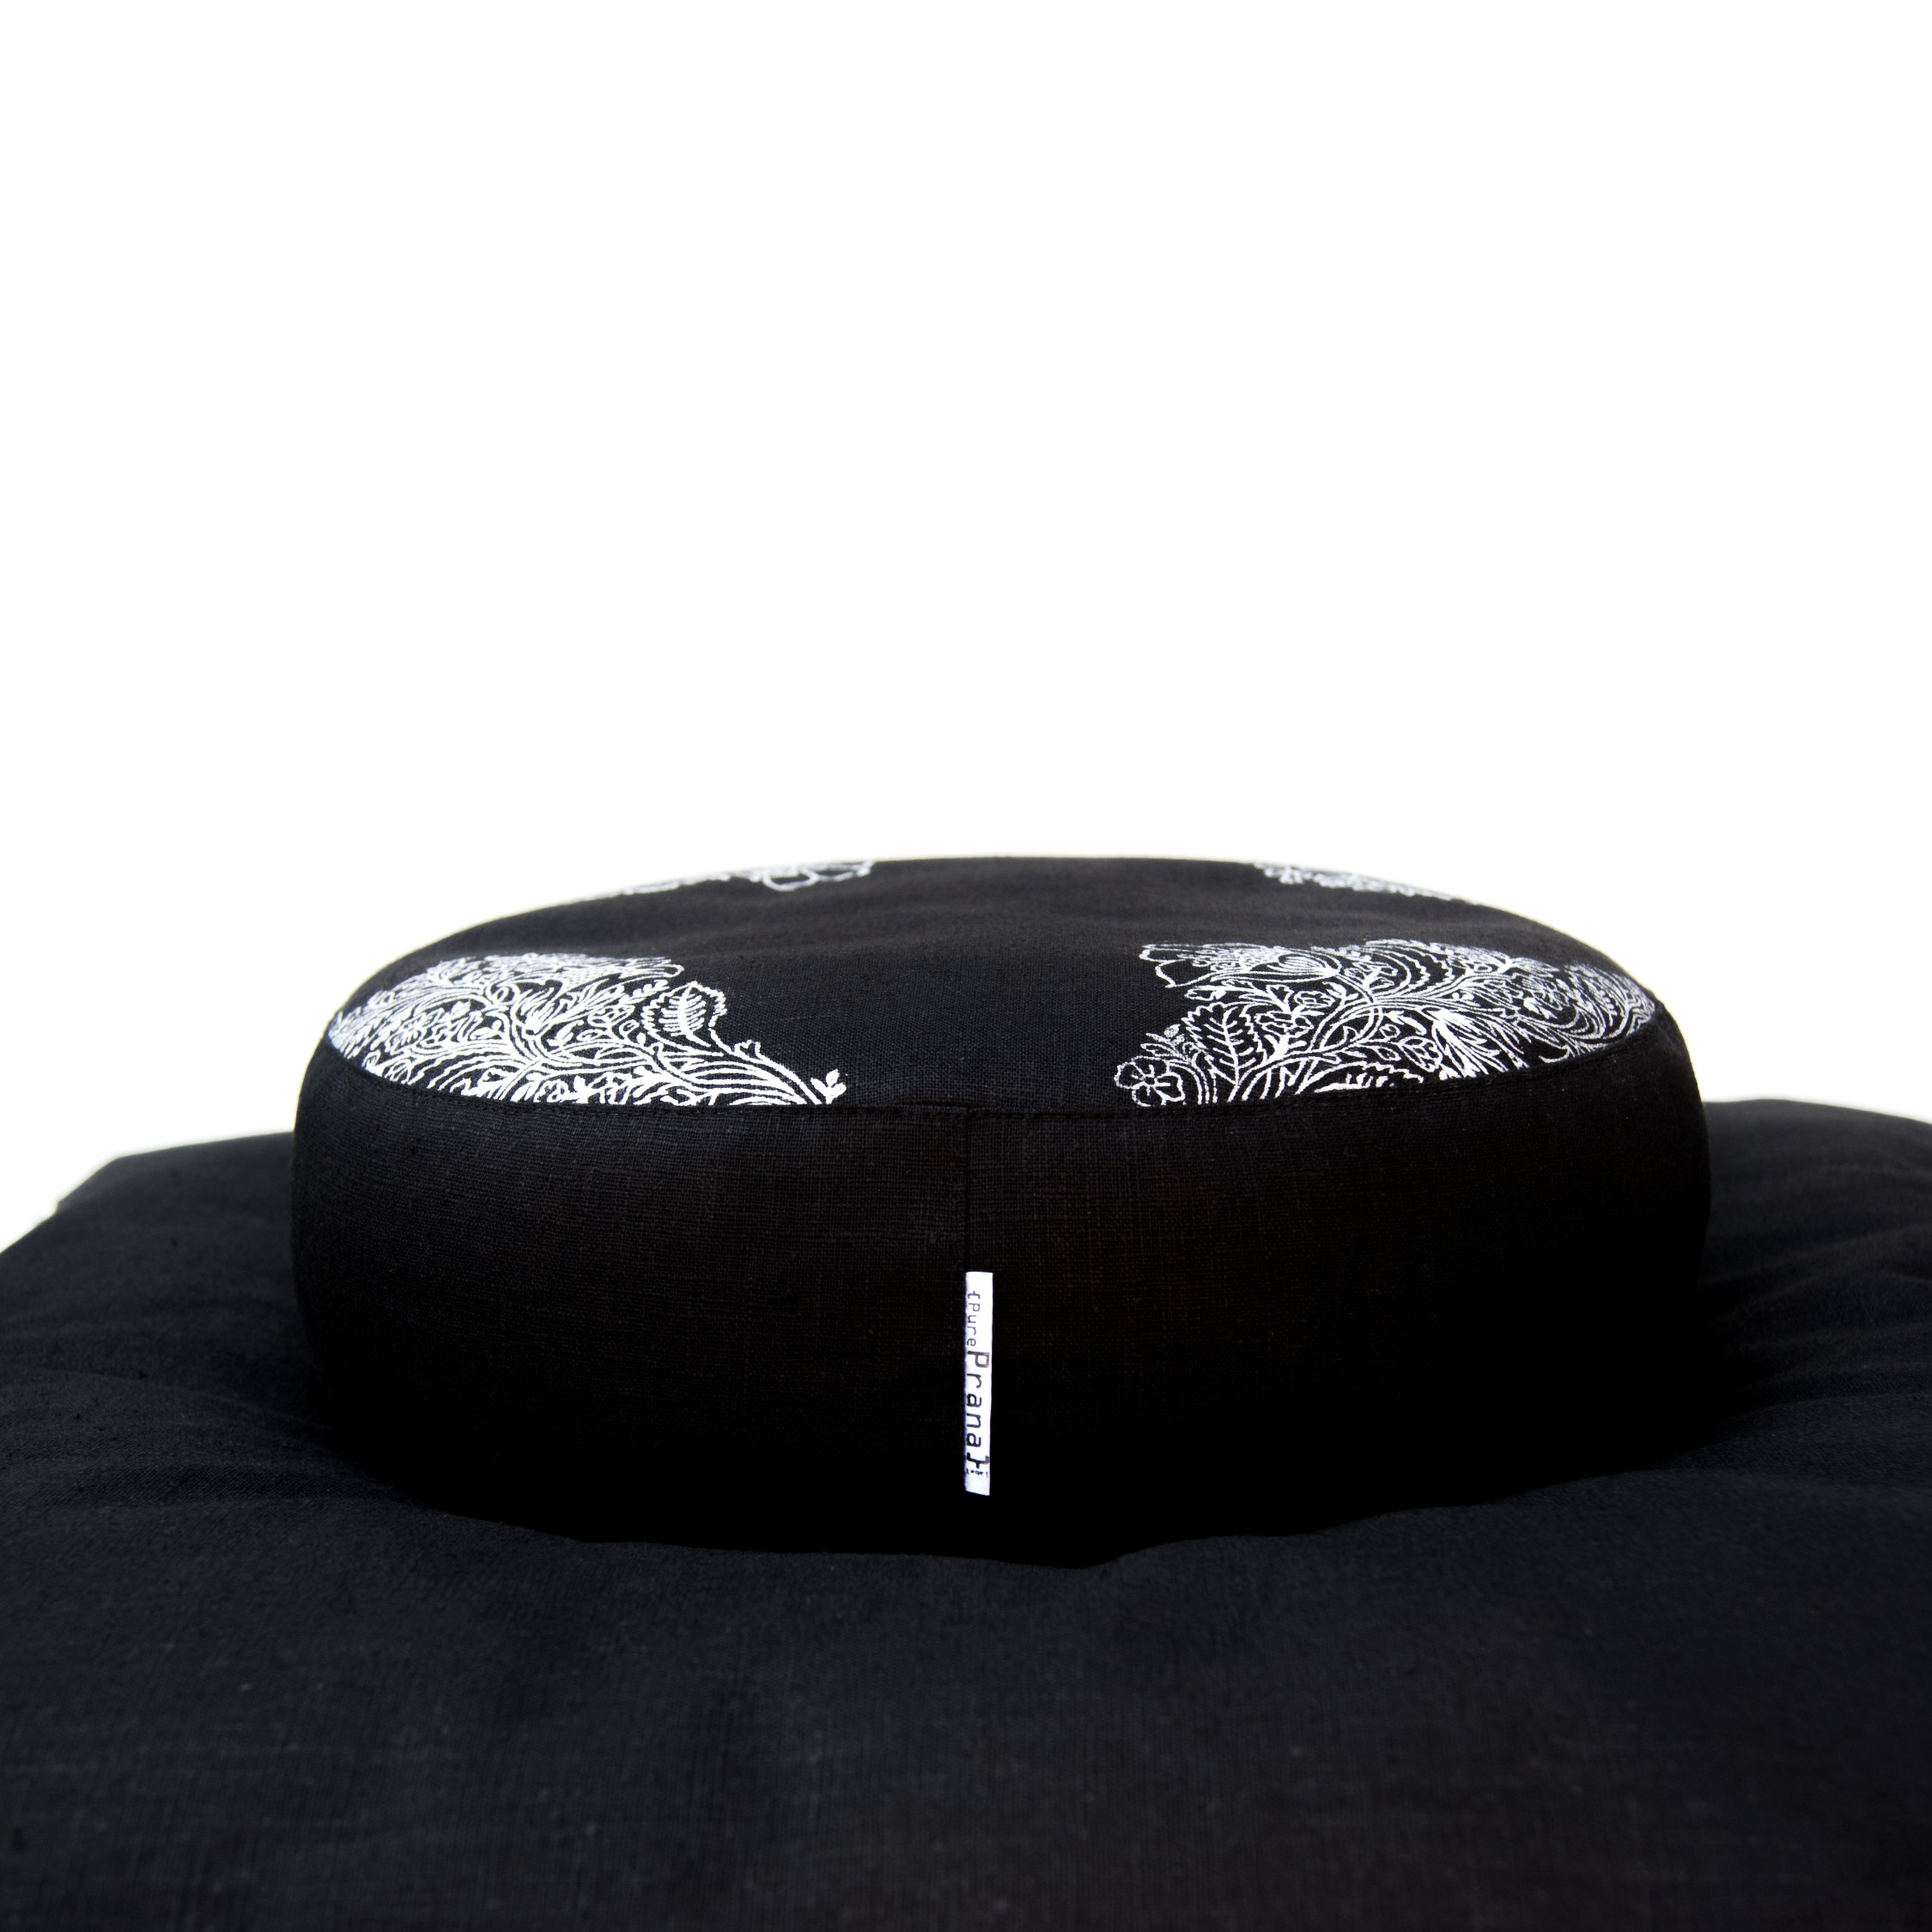 Meditation set in black Oeko TEX certified flax linen